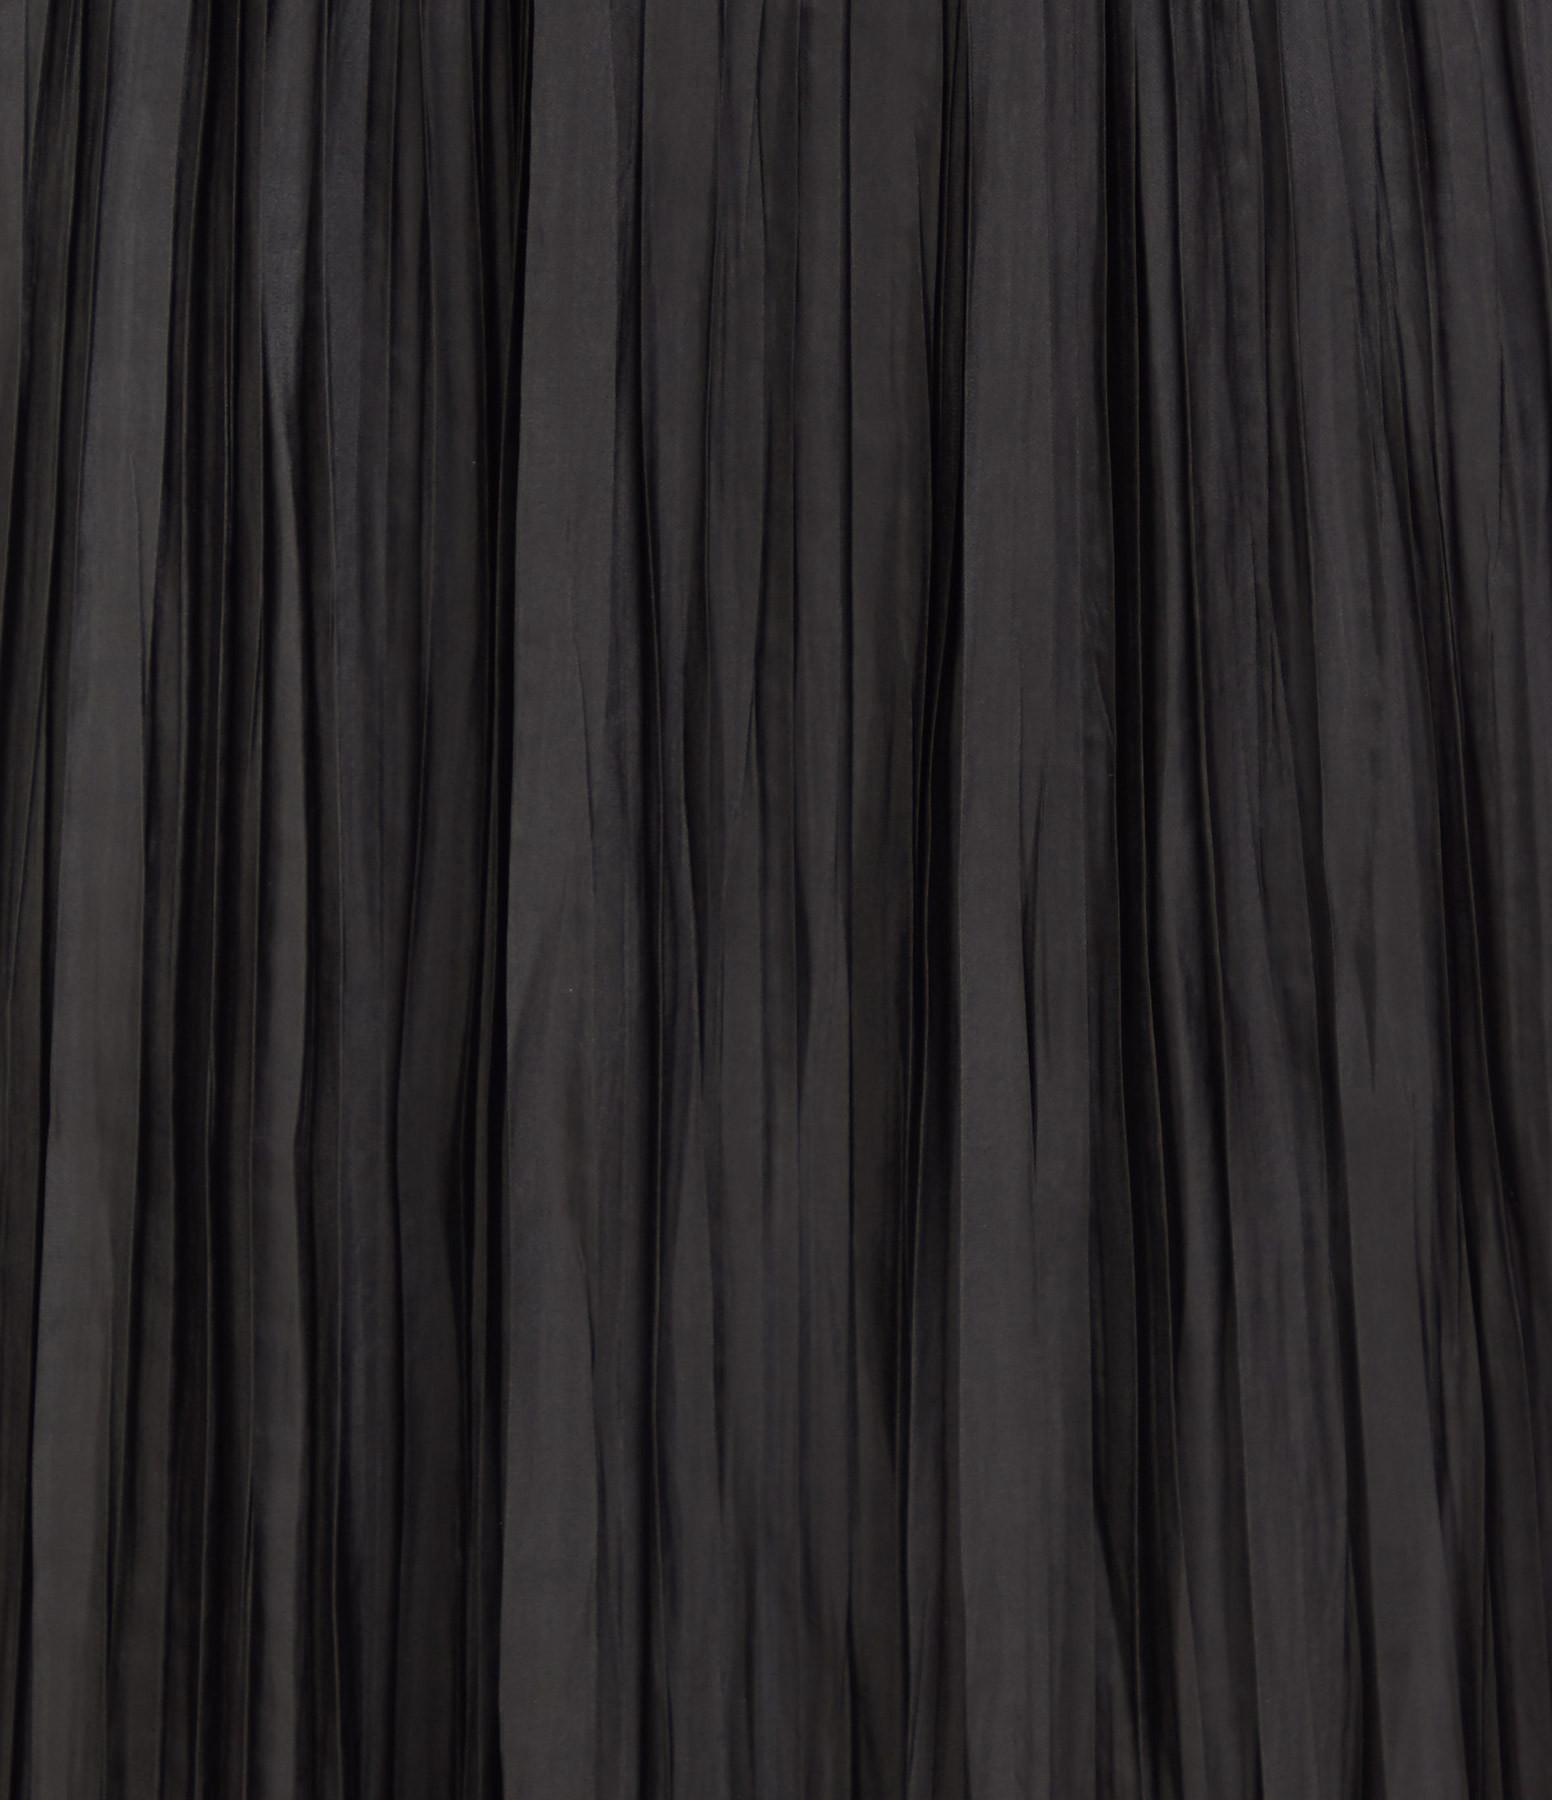 ROBERTO COLLINA - Jupe Plissée Noir